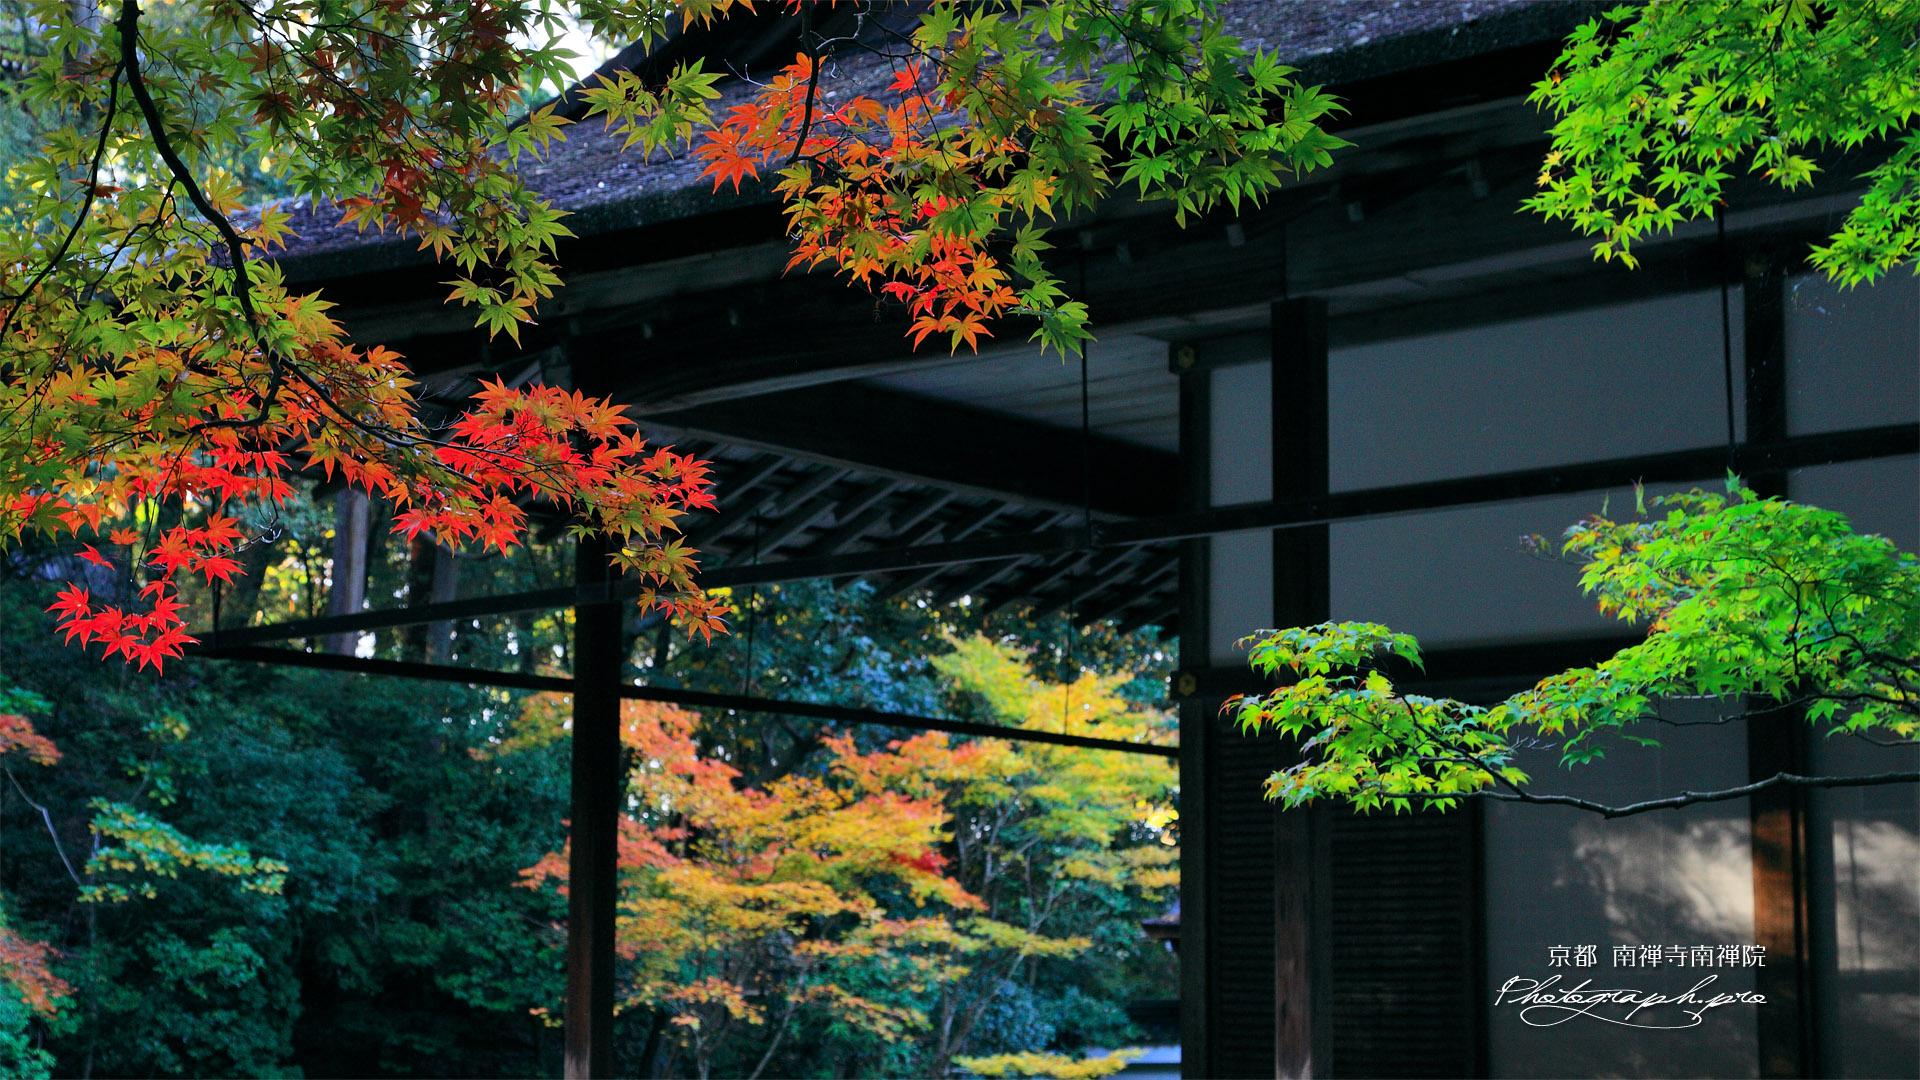 南禅寺南禅院 初紅葉と方丈